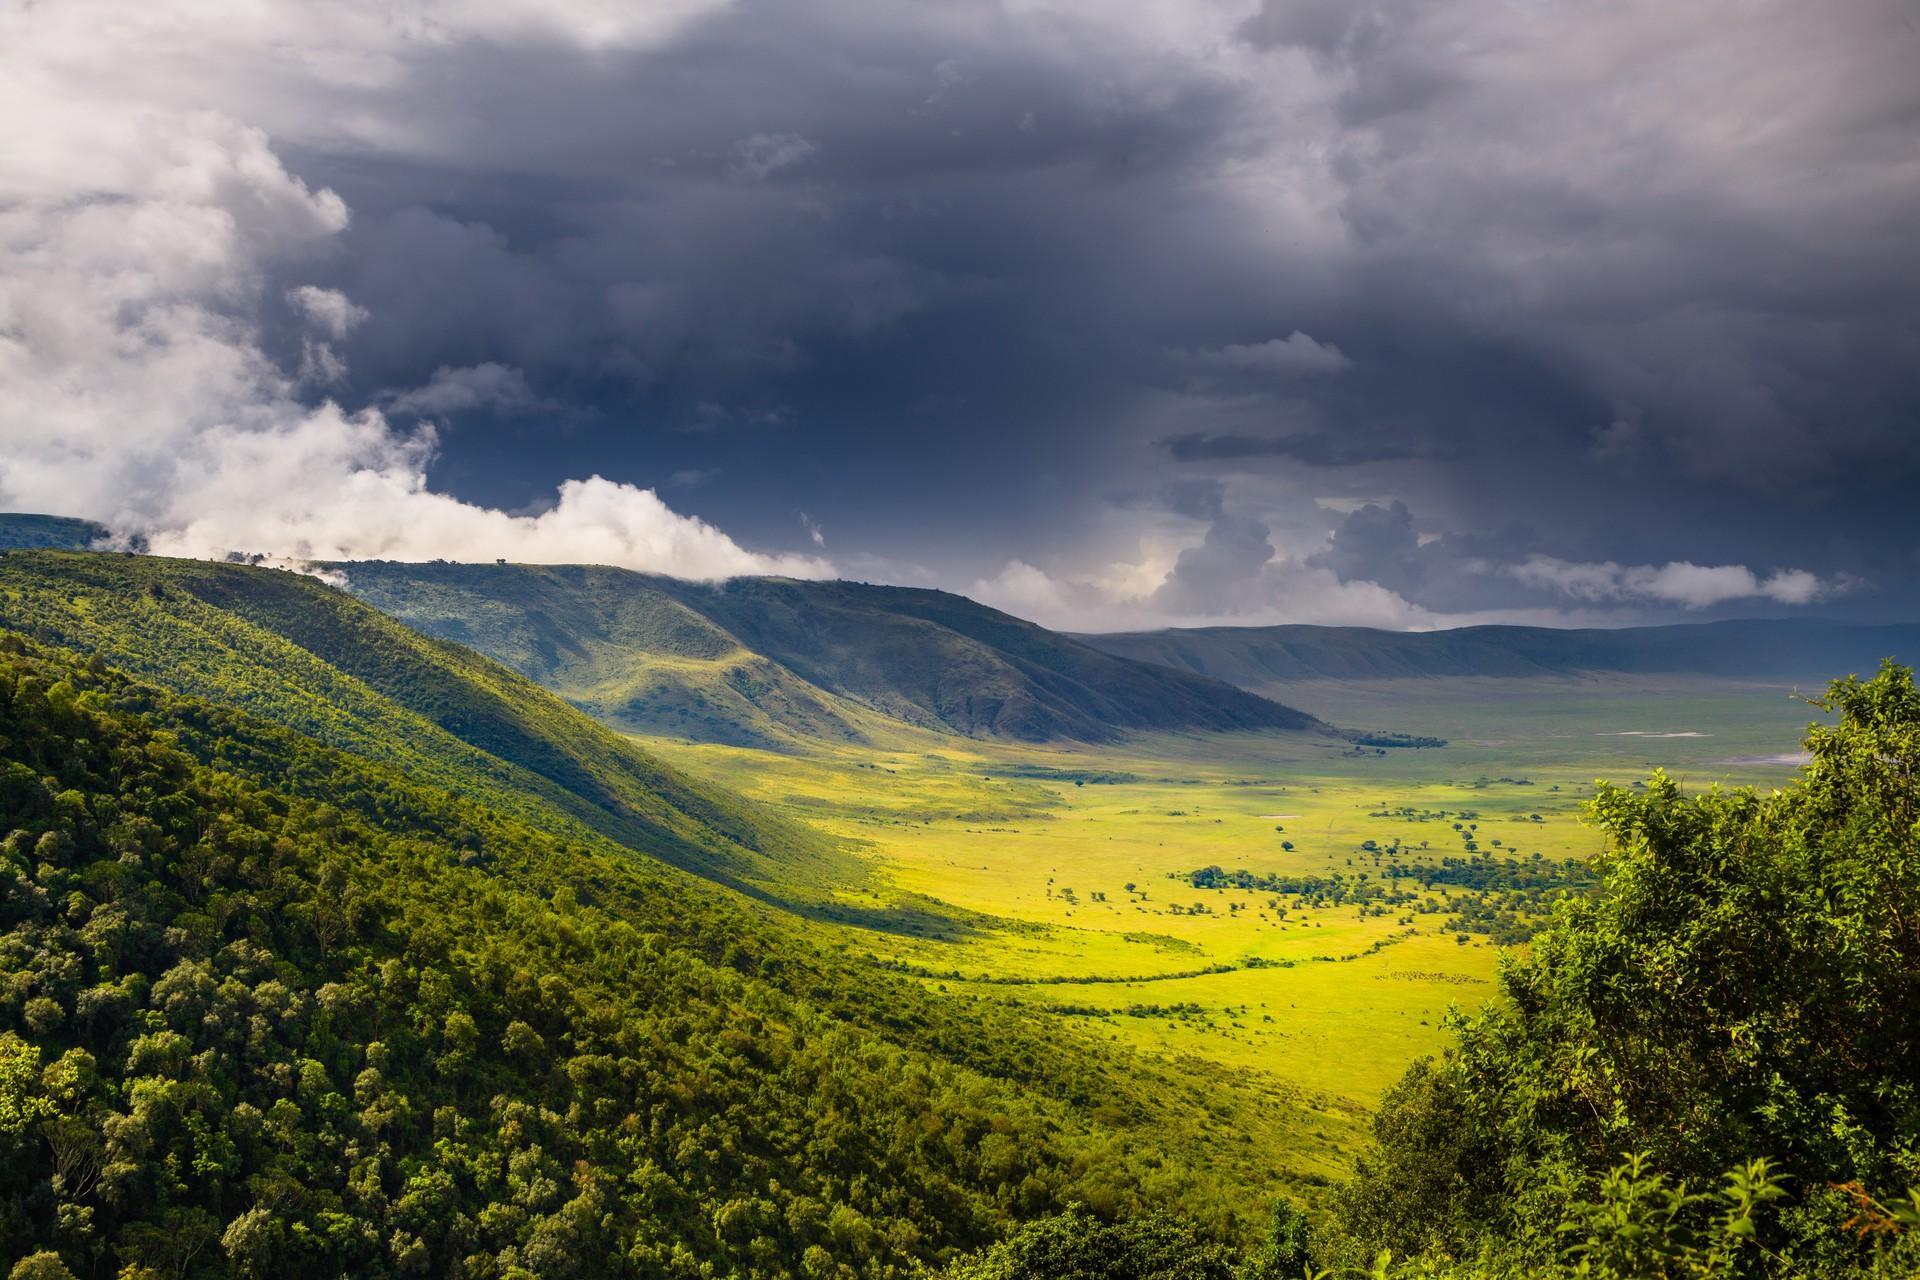 Rain clouds gather over the Nukuru Crater in Kenya